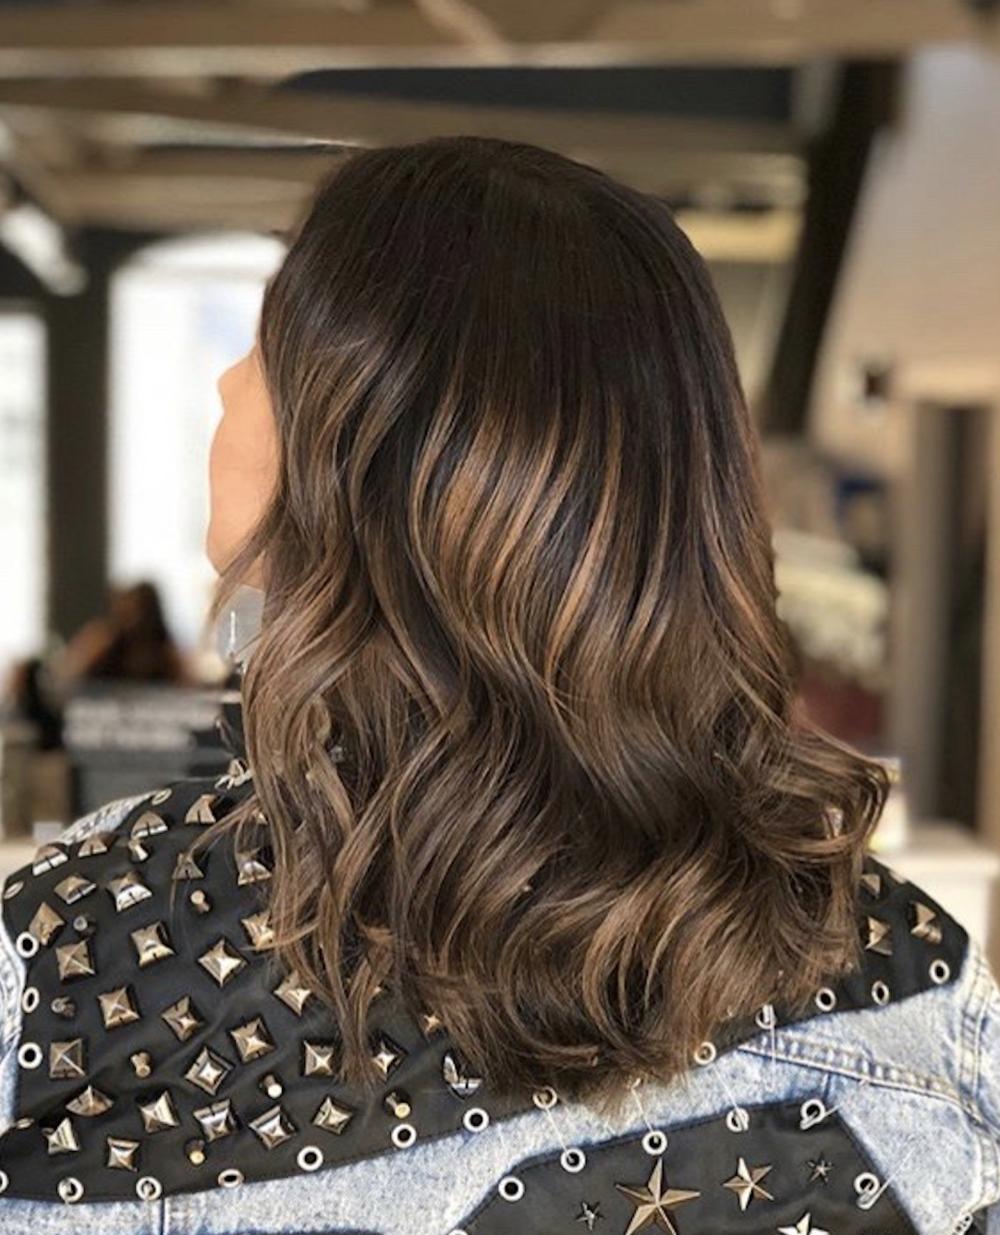 Top Hair Salon Toronto Balayage Brunette.png